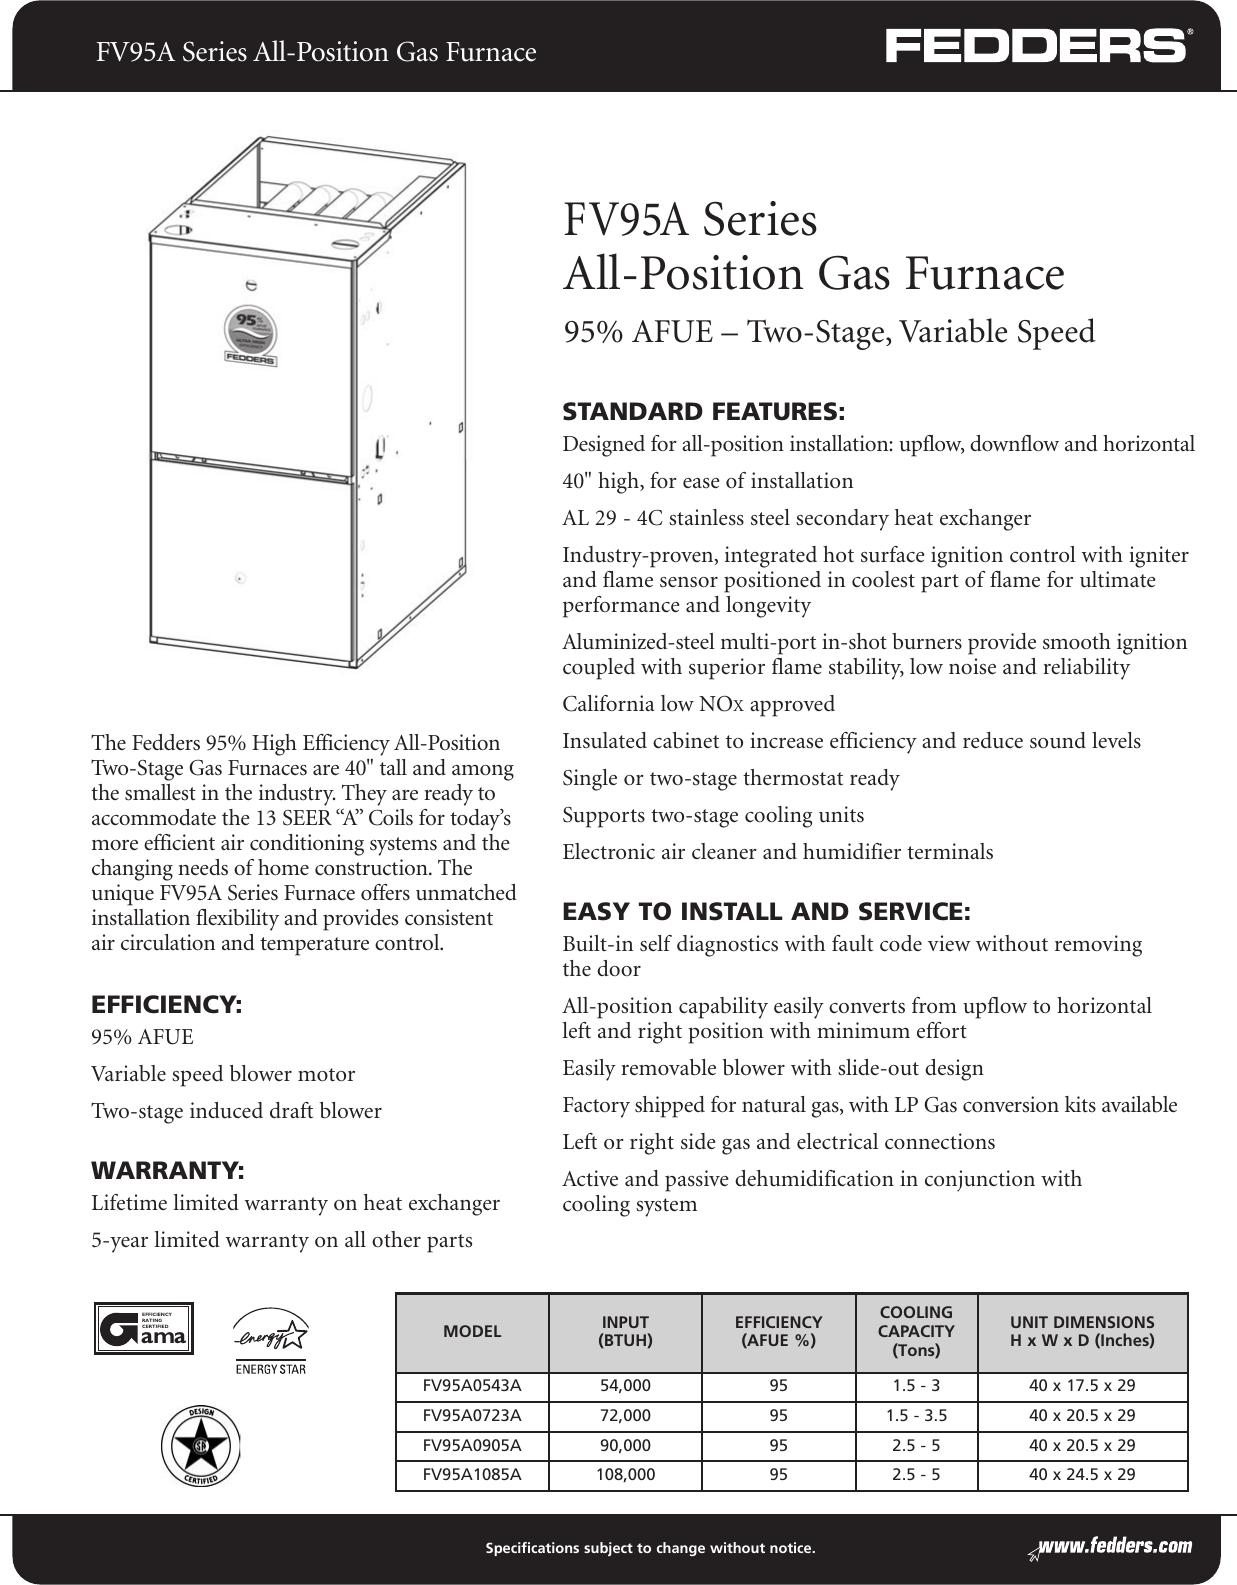 Fedders Fv95A Series Users Manual F C13 0206